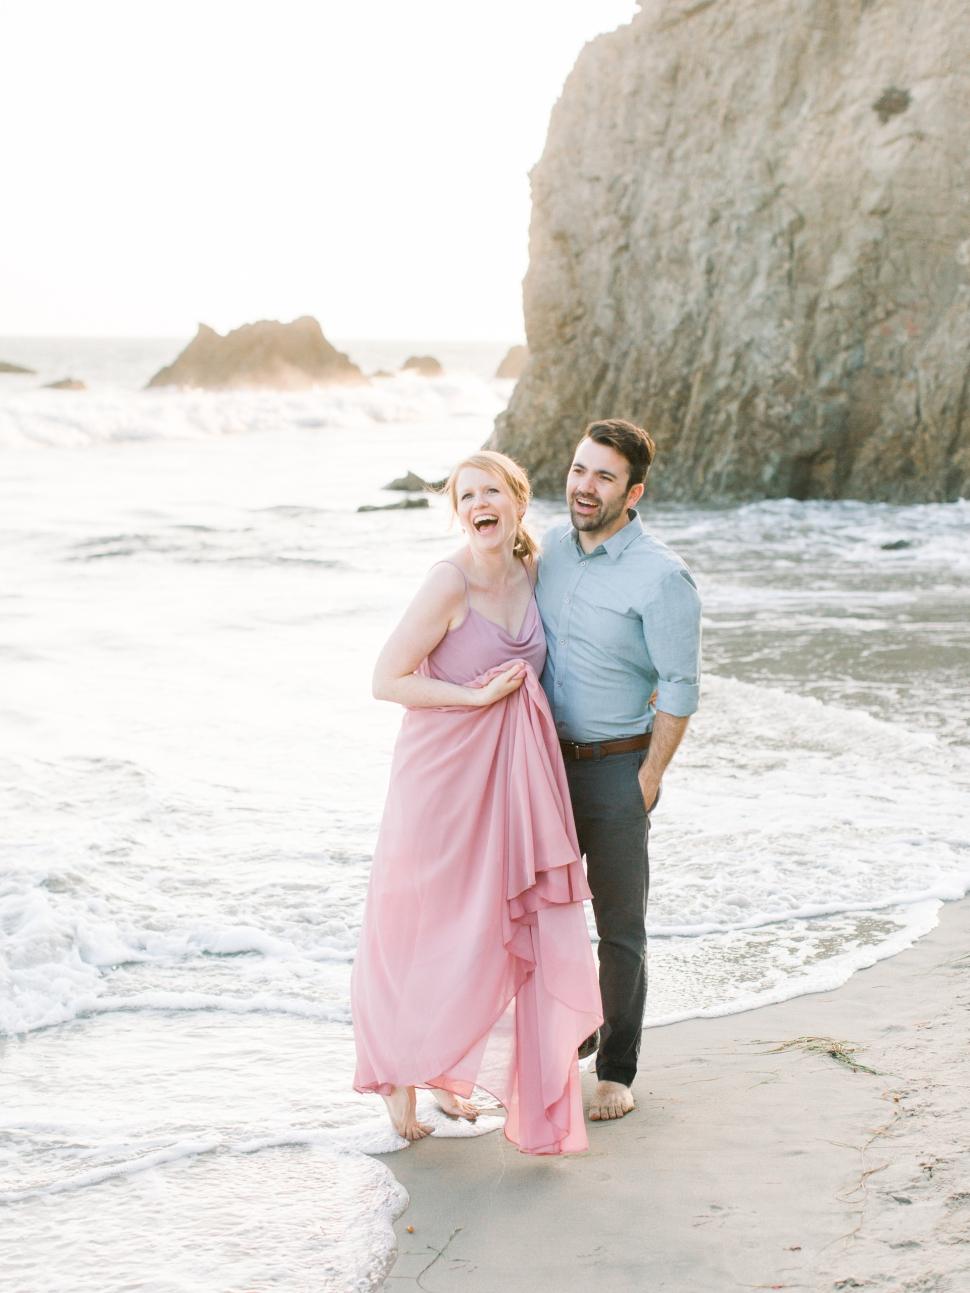 Malibu-Wedding-Photographer-Cassi-Claire-El-Matador-State-Beach-Engagement-Session_01.jpg